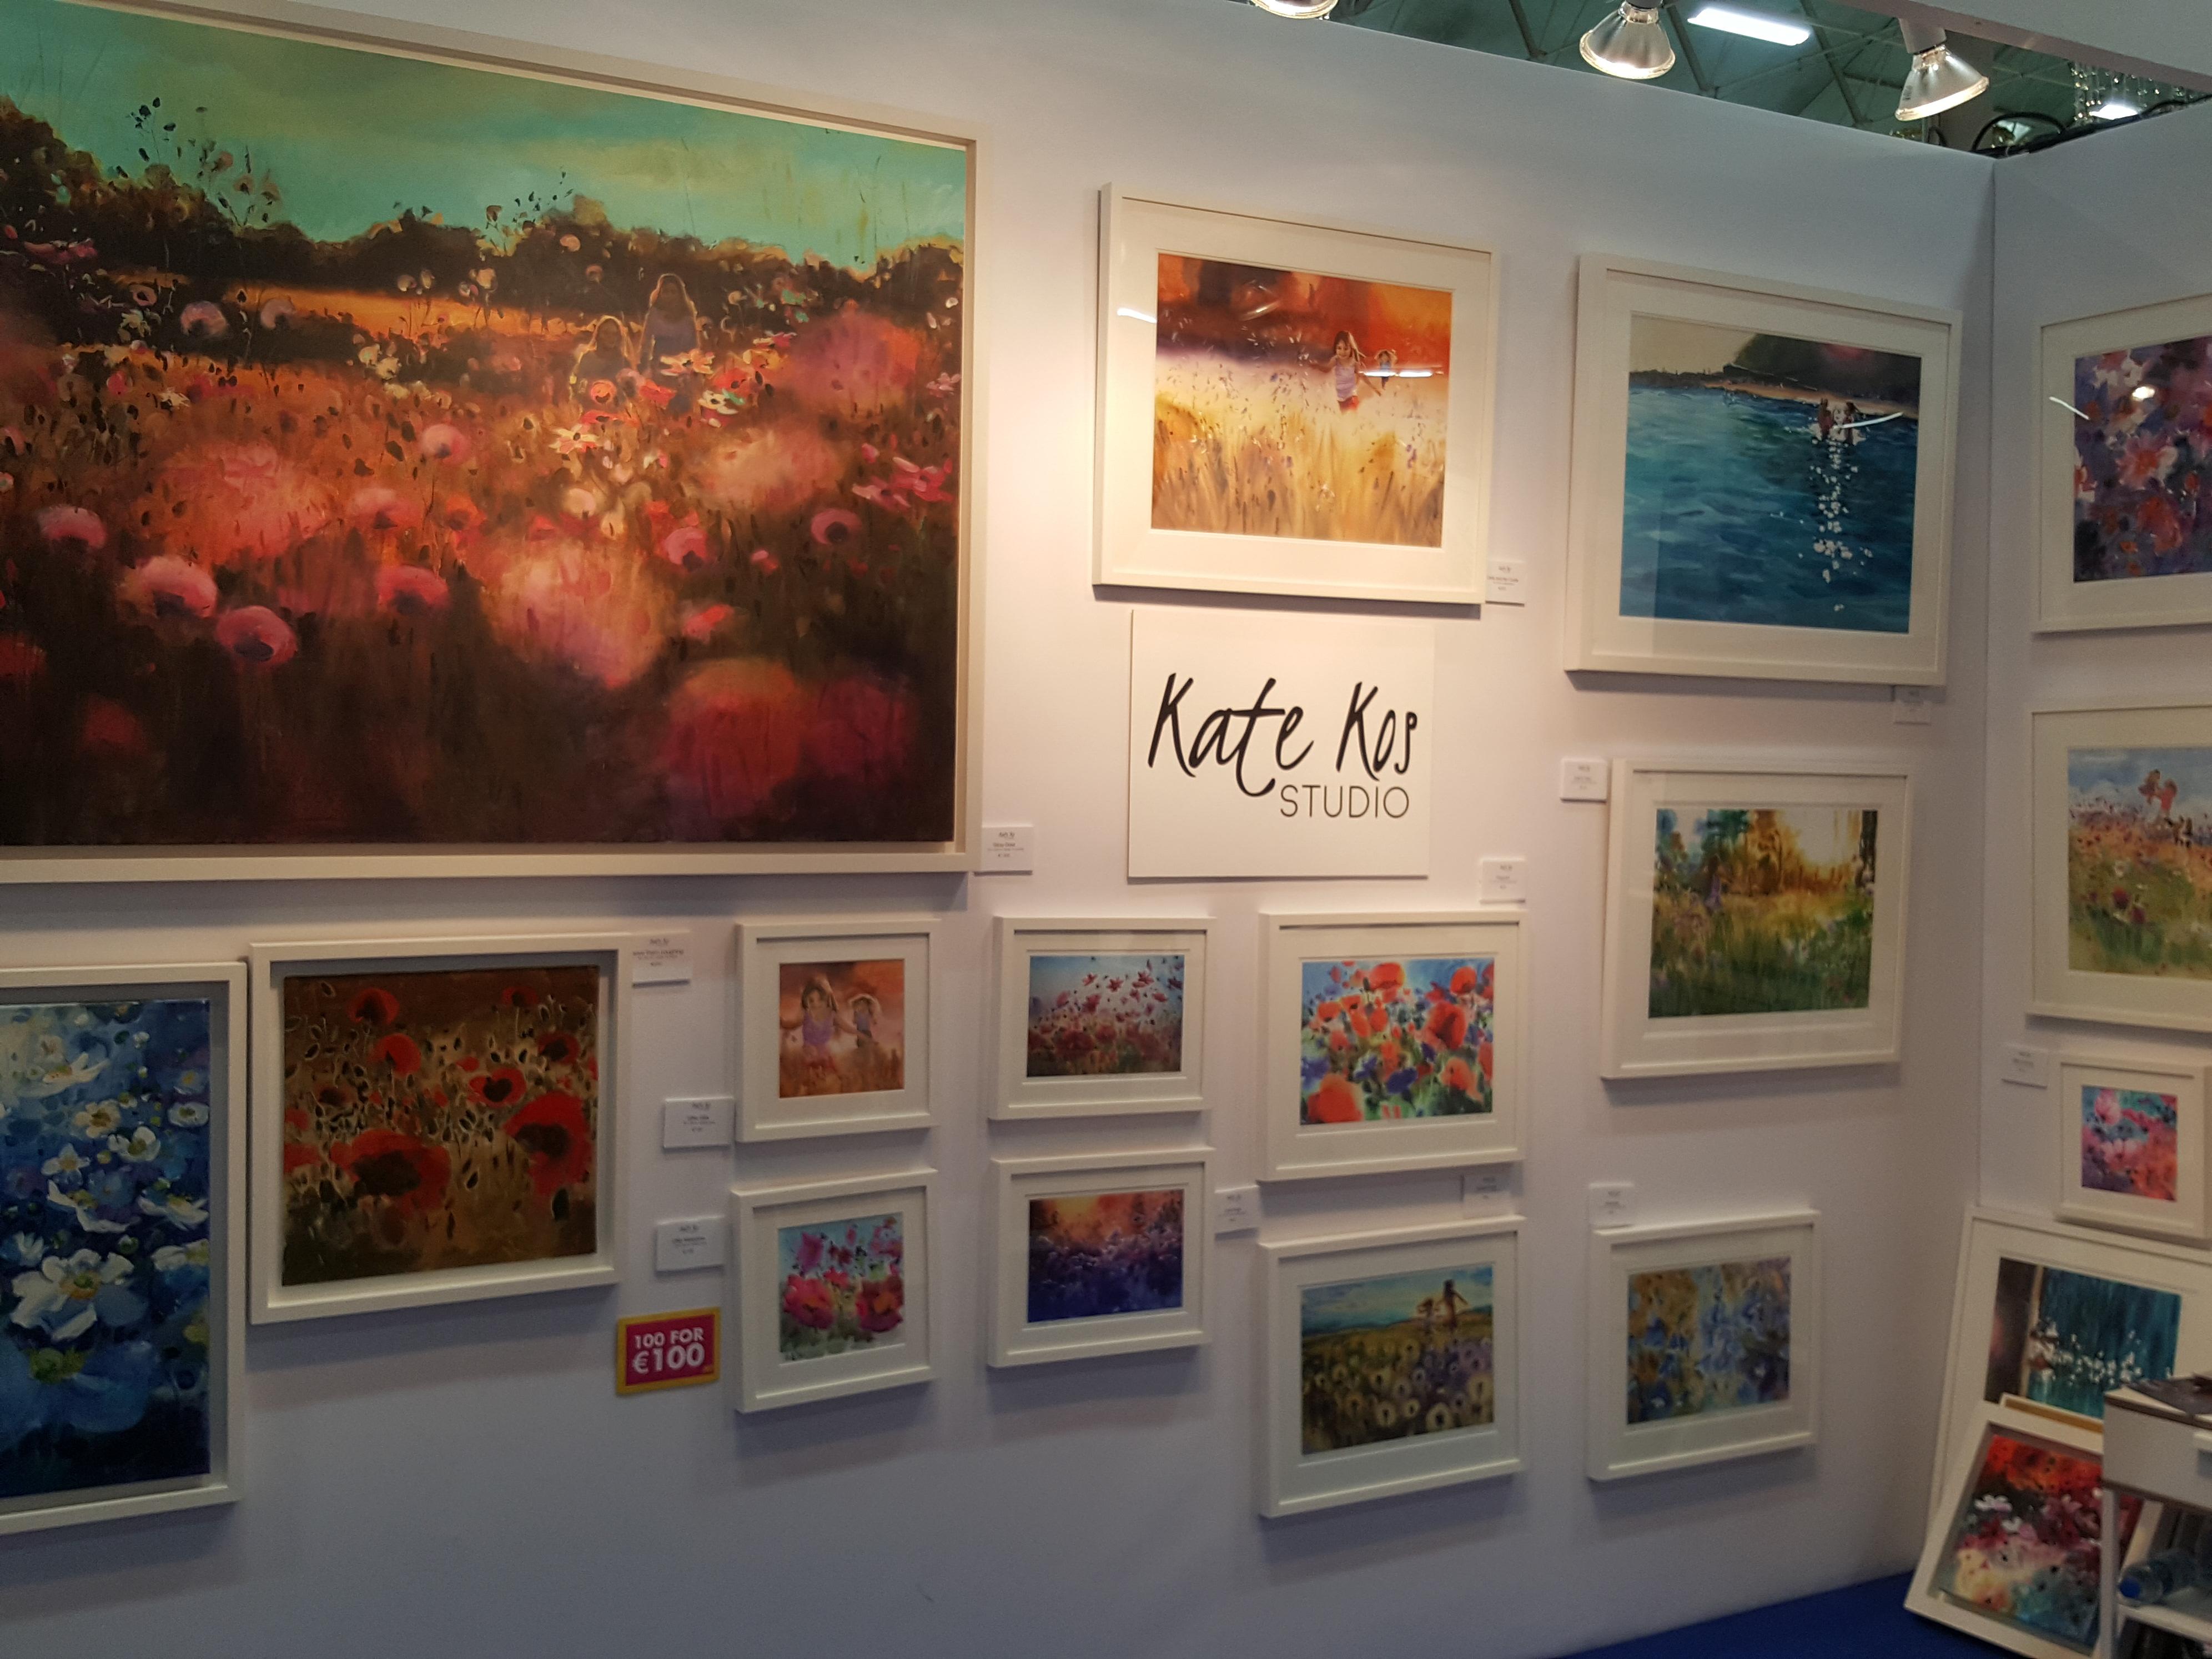 Kate Kos Studio - ArtSource stand